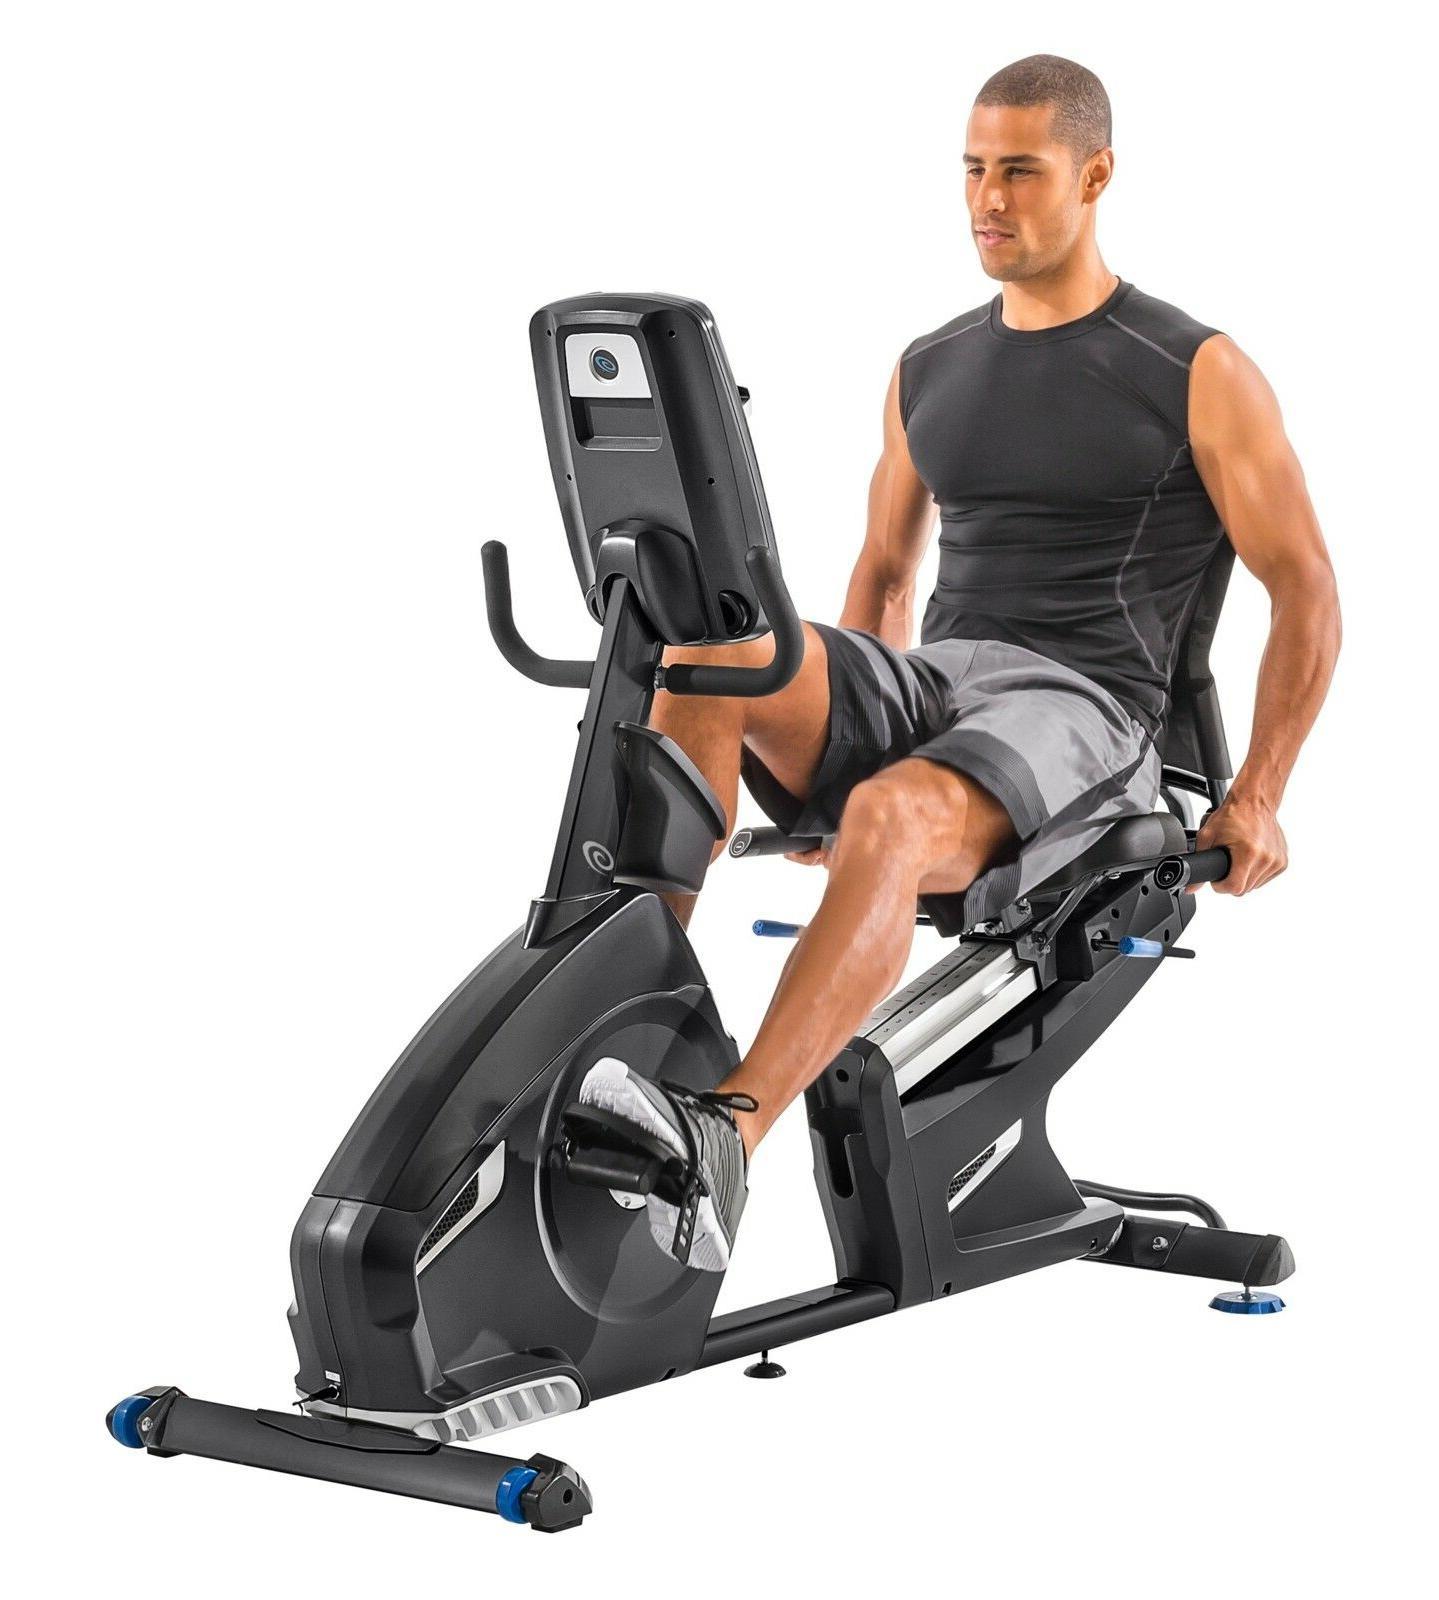 Nautilus R616 Bike Nautilus T614 Treadmill